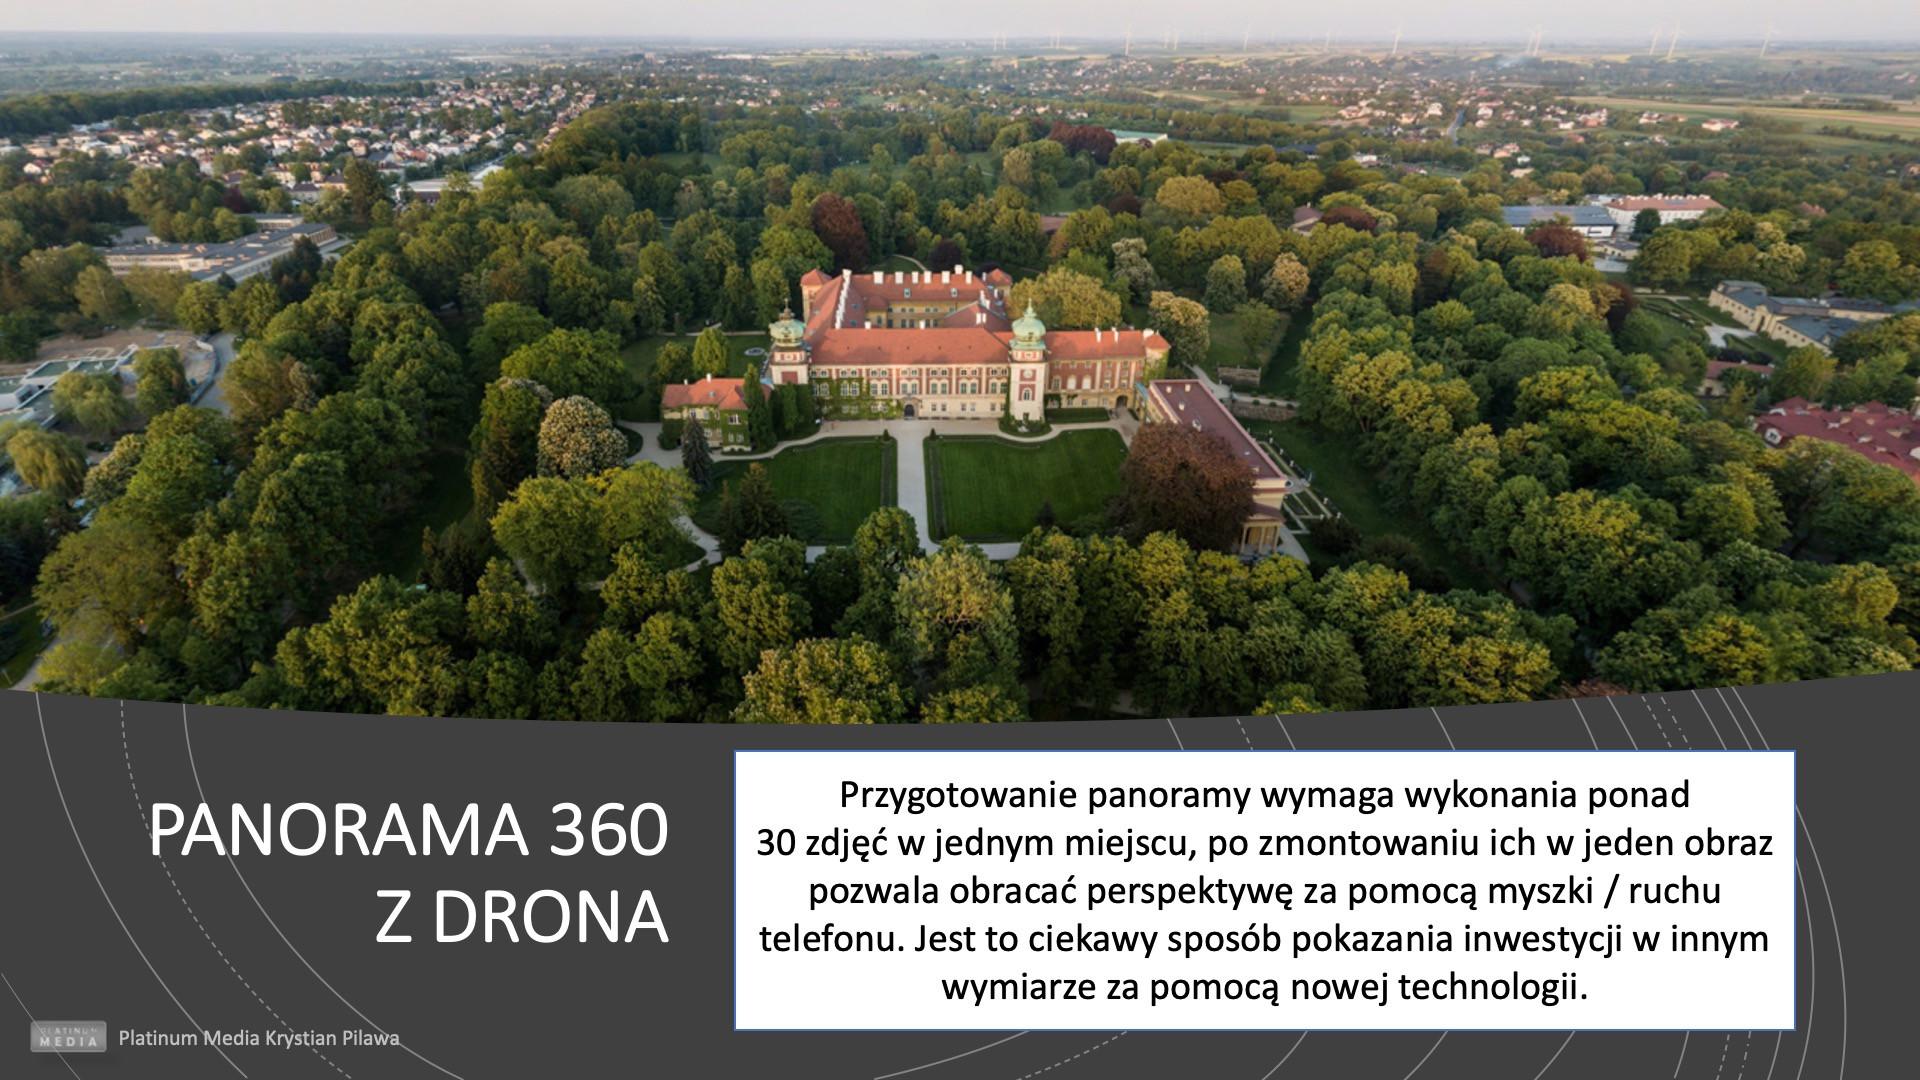 Panorama z drona